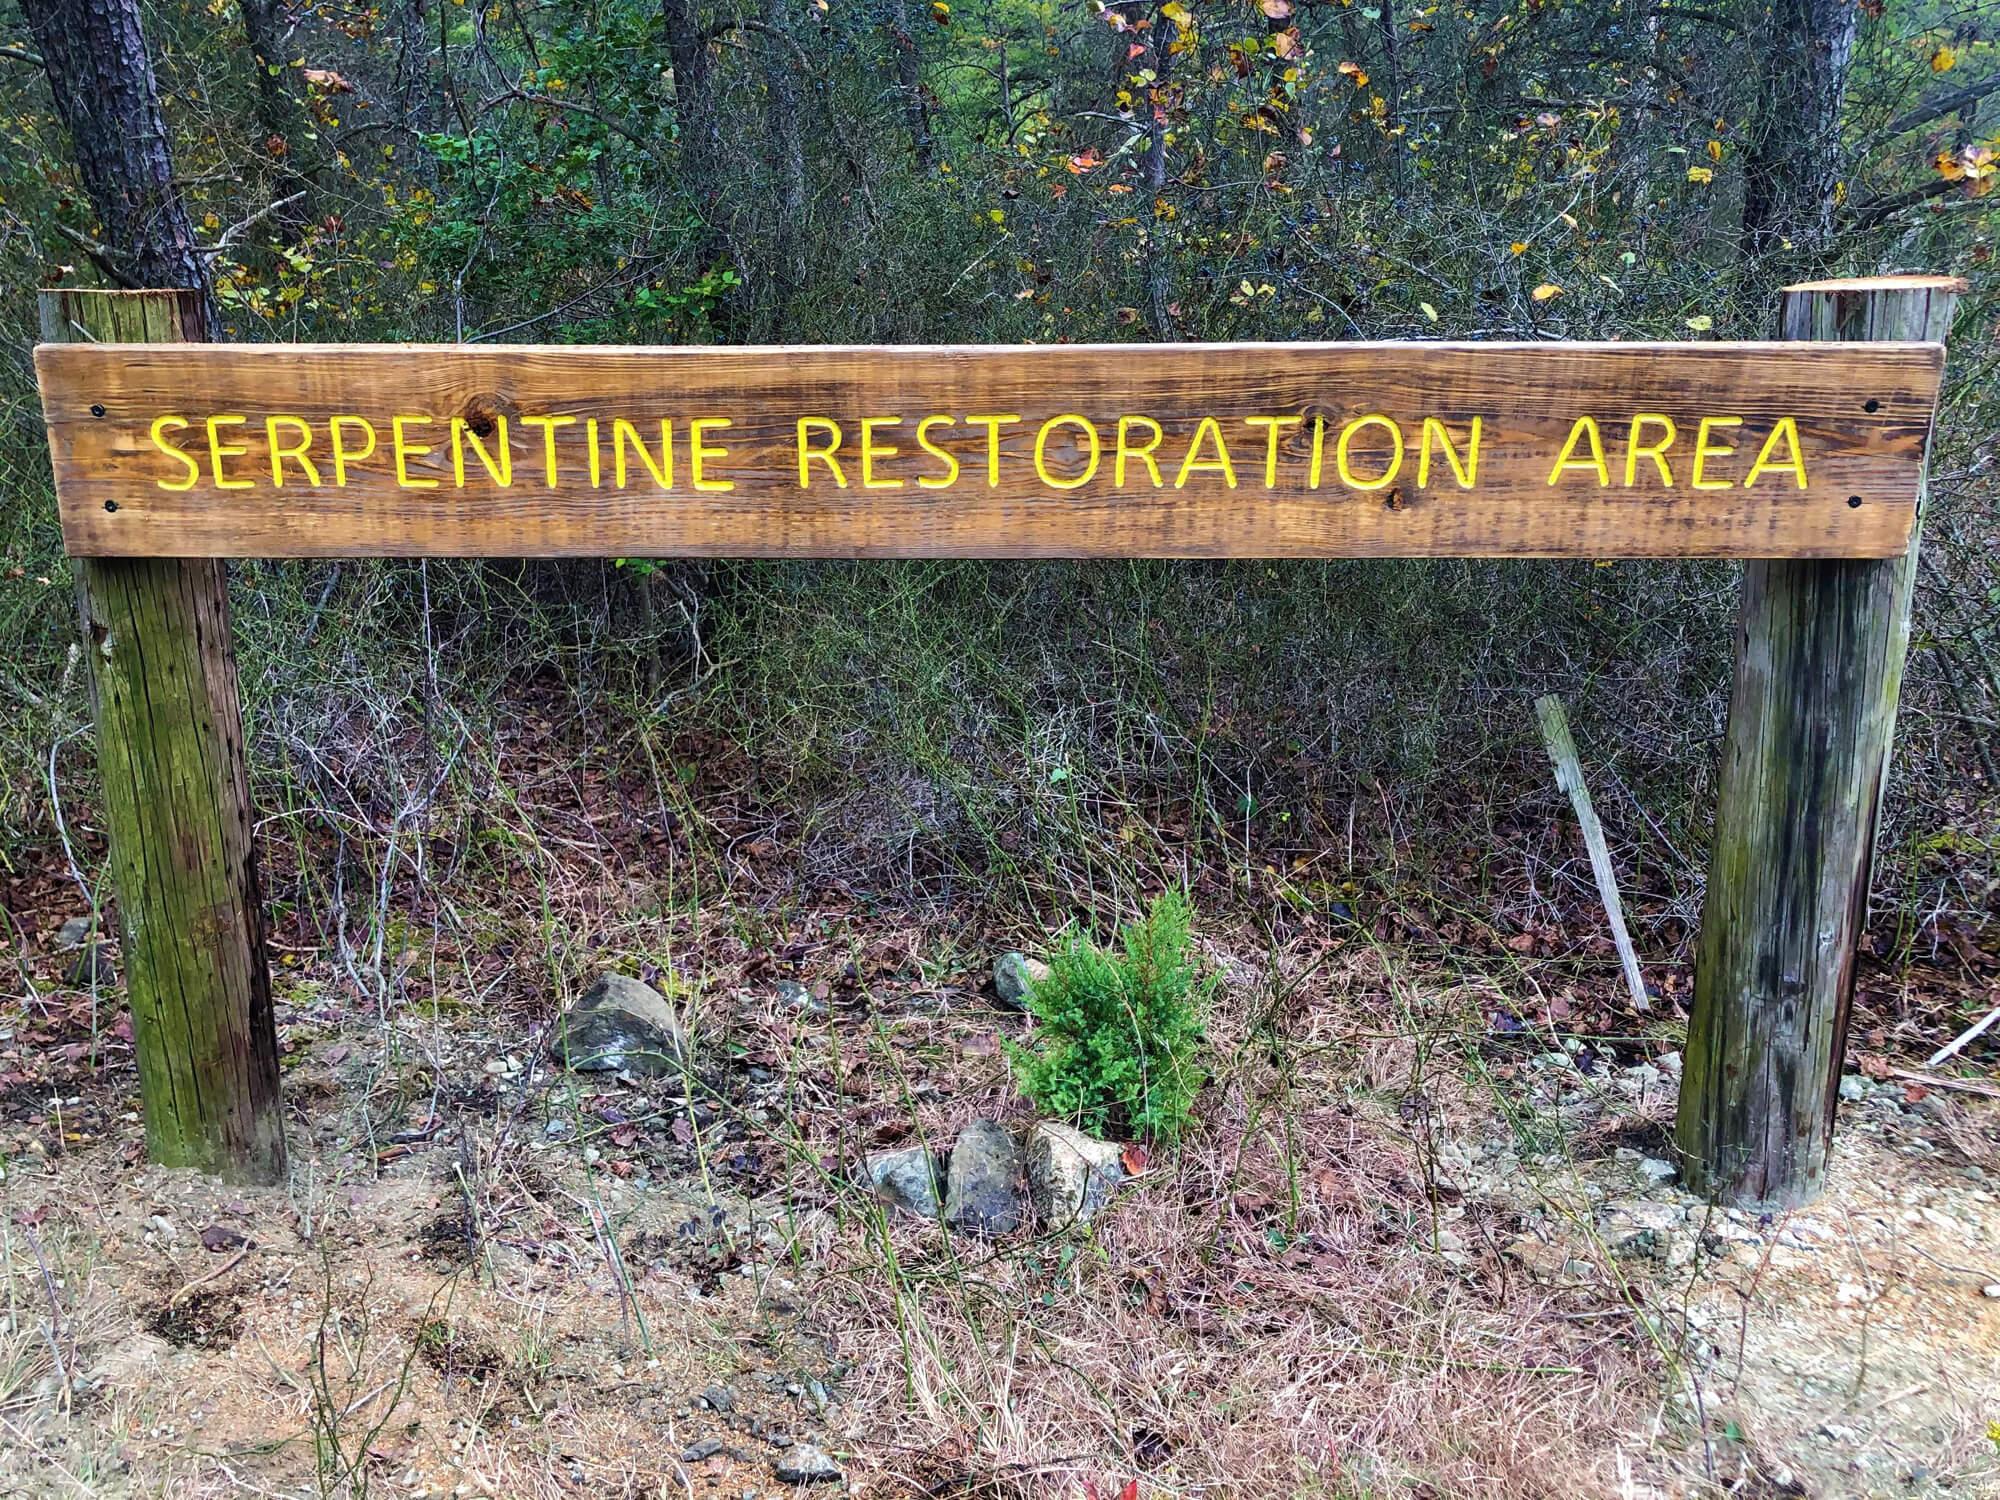 Serpentine service road sign